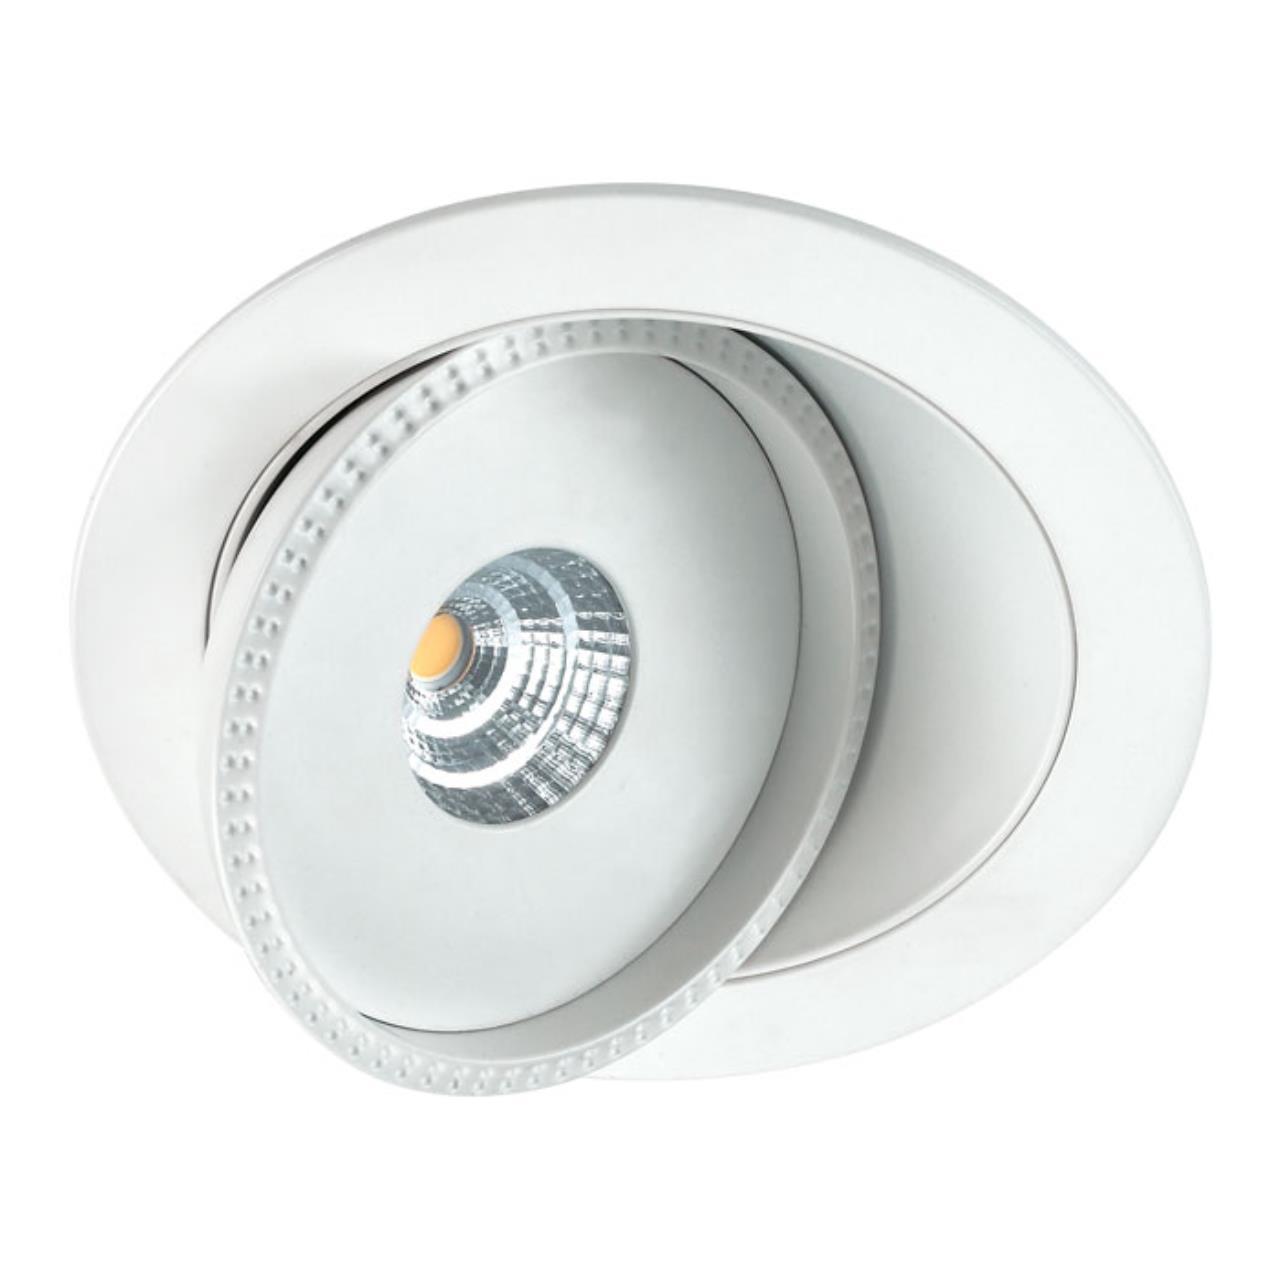 357347 SPOT NT17 080 белый Встраиваемый светильник IP20 LED 3000K 7W 85-265V GESSO